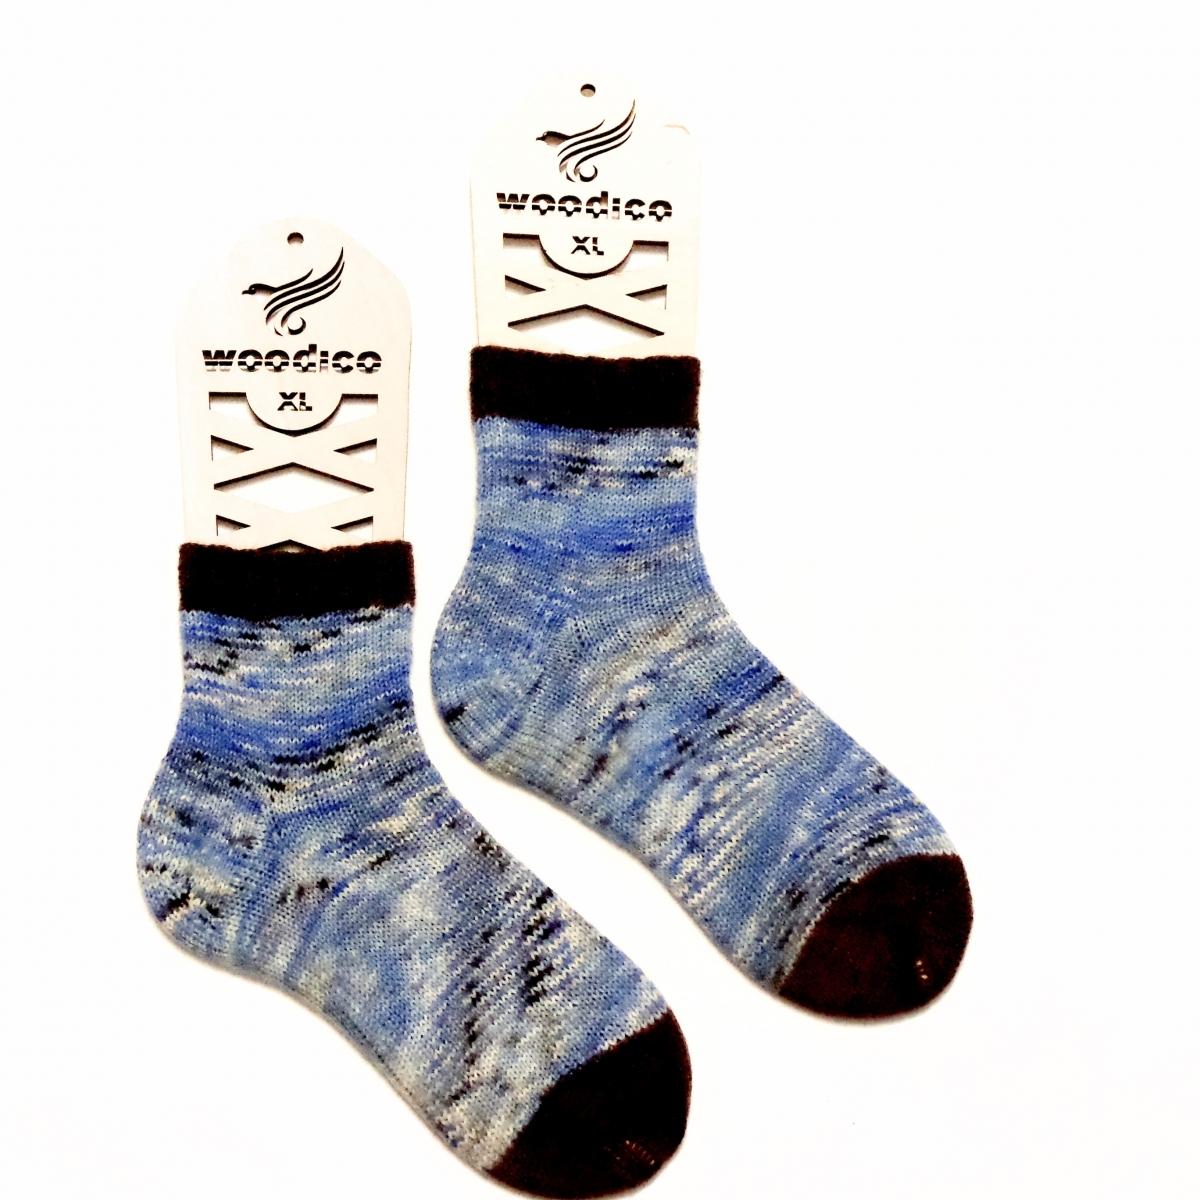 woodico.pro wooden sock blockers aquila 24 1200x1200 - Wooden sock blockers / Aquila